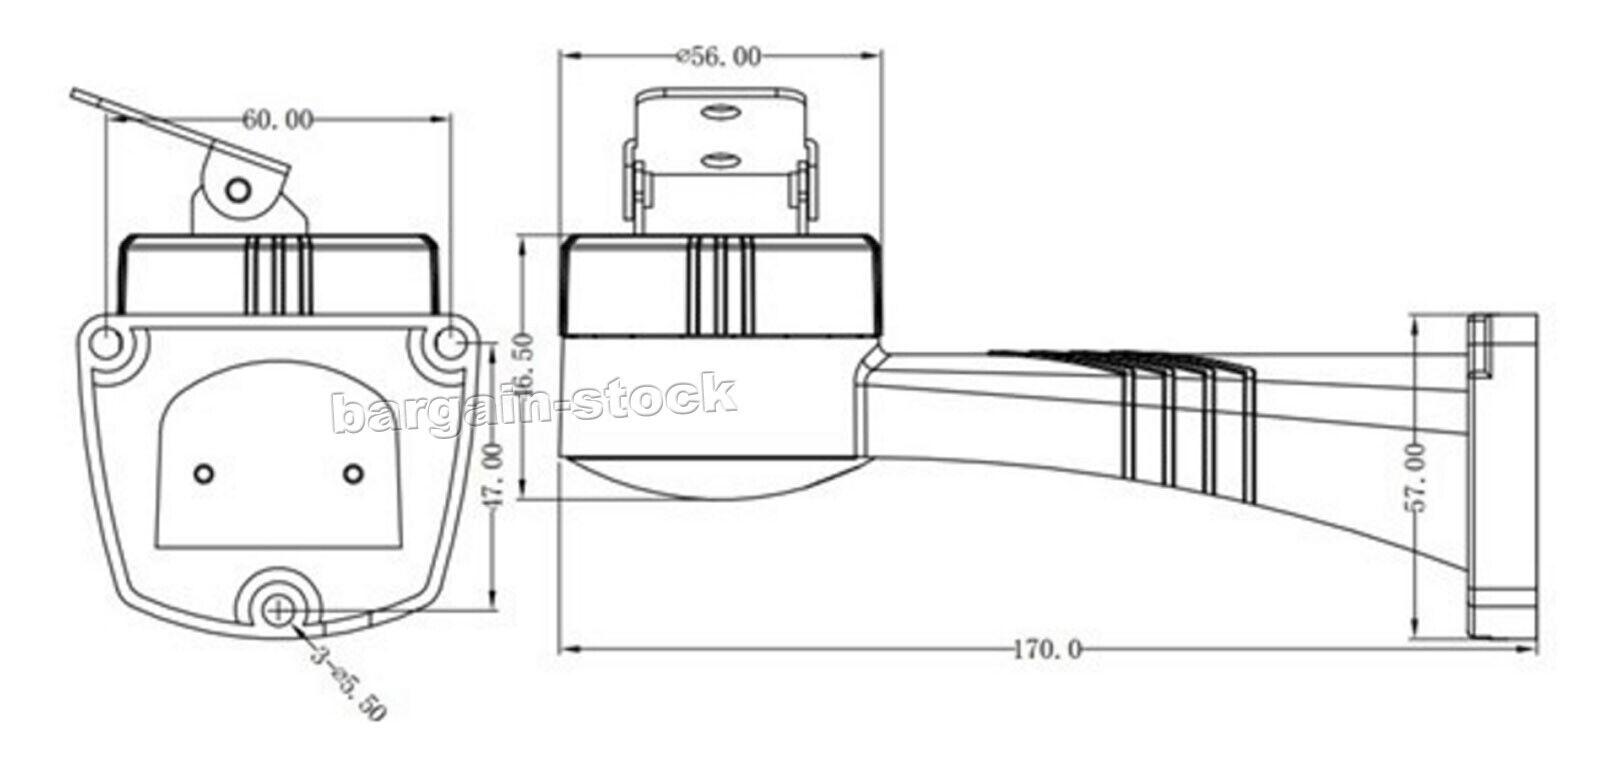 hight resolution of ptz motorized rotation bracket holder rs485 pelco d control for cctv camera